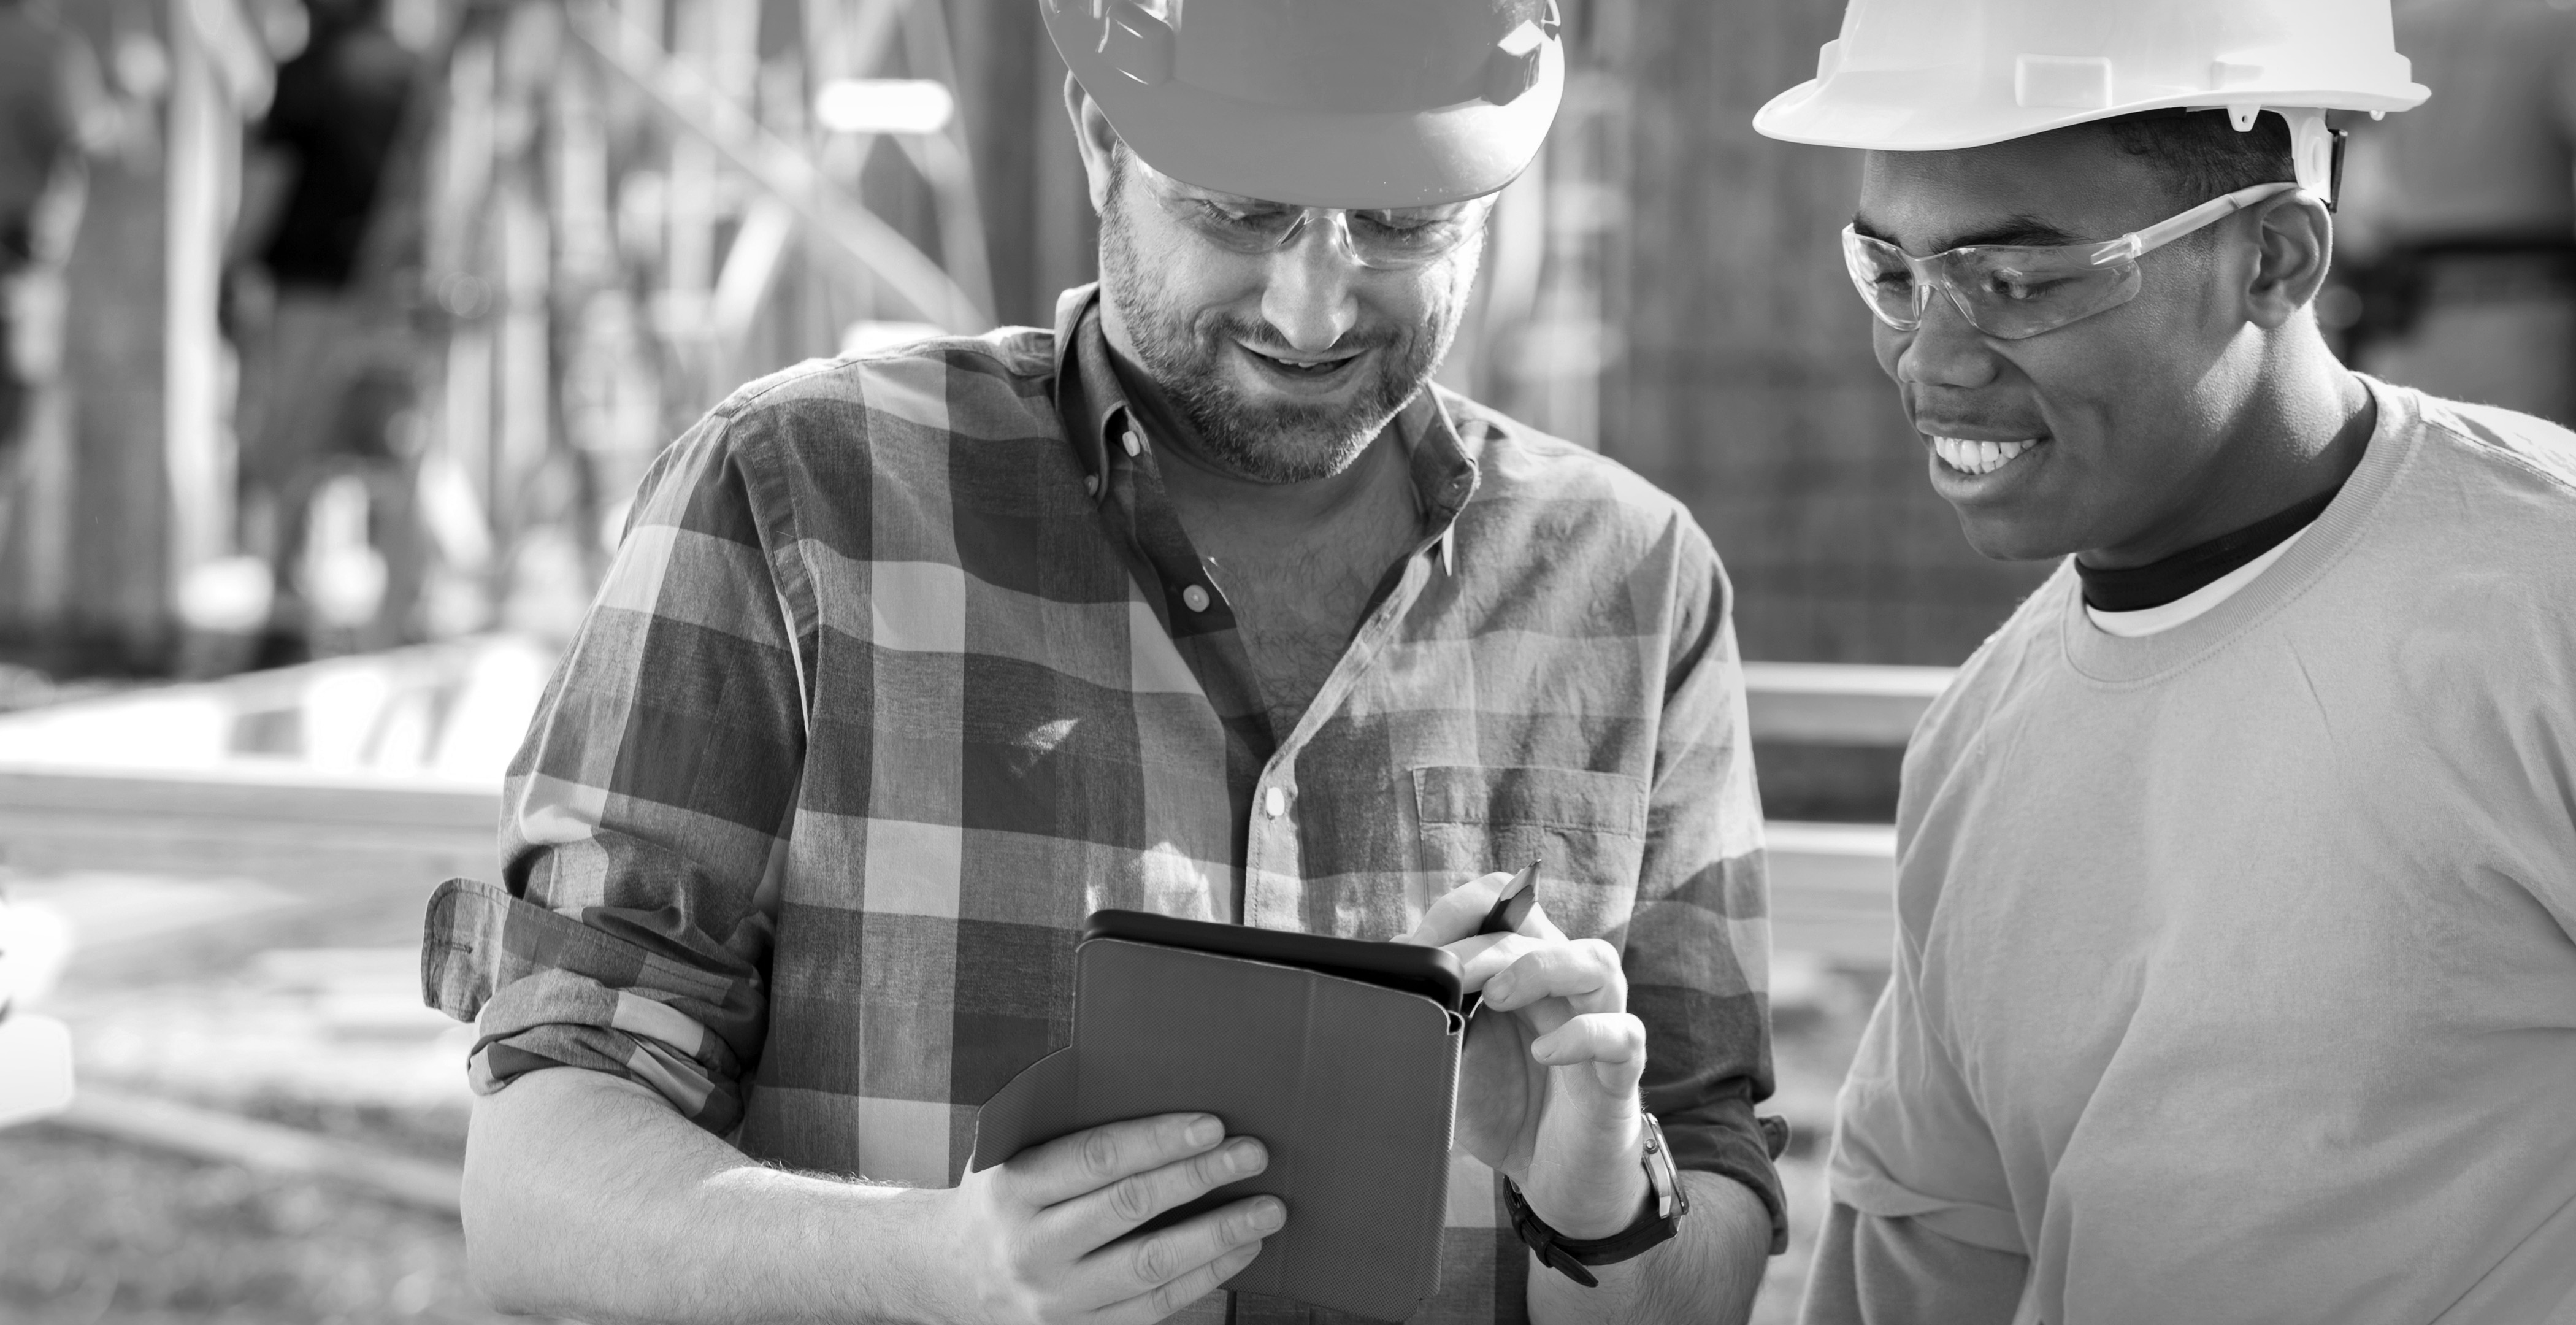 Construction Foreman Uses Digital Tablet